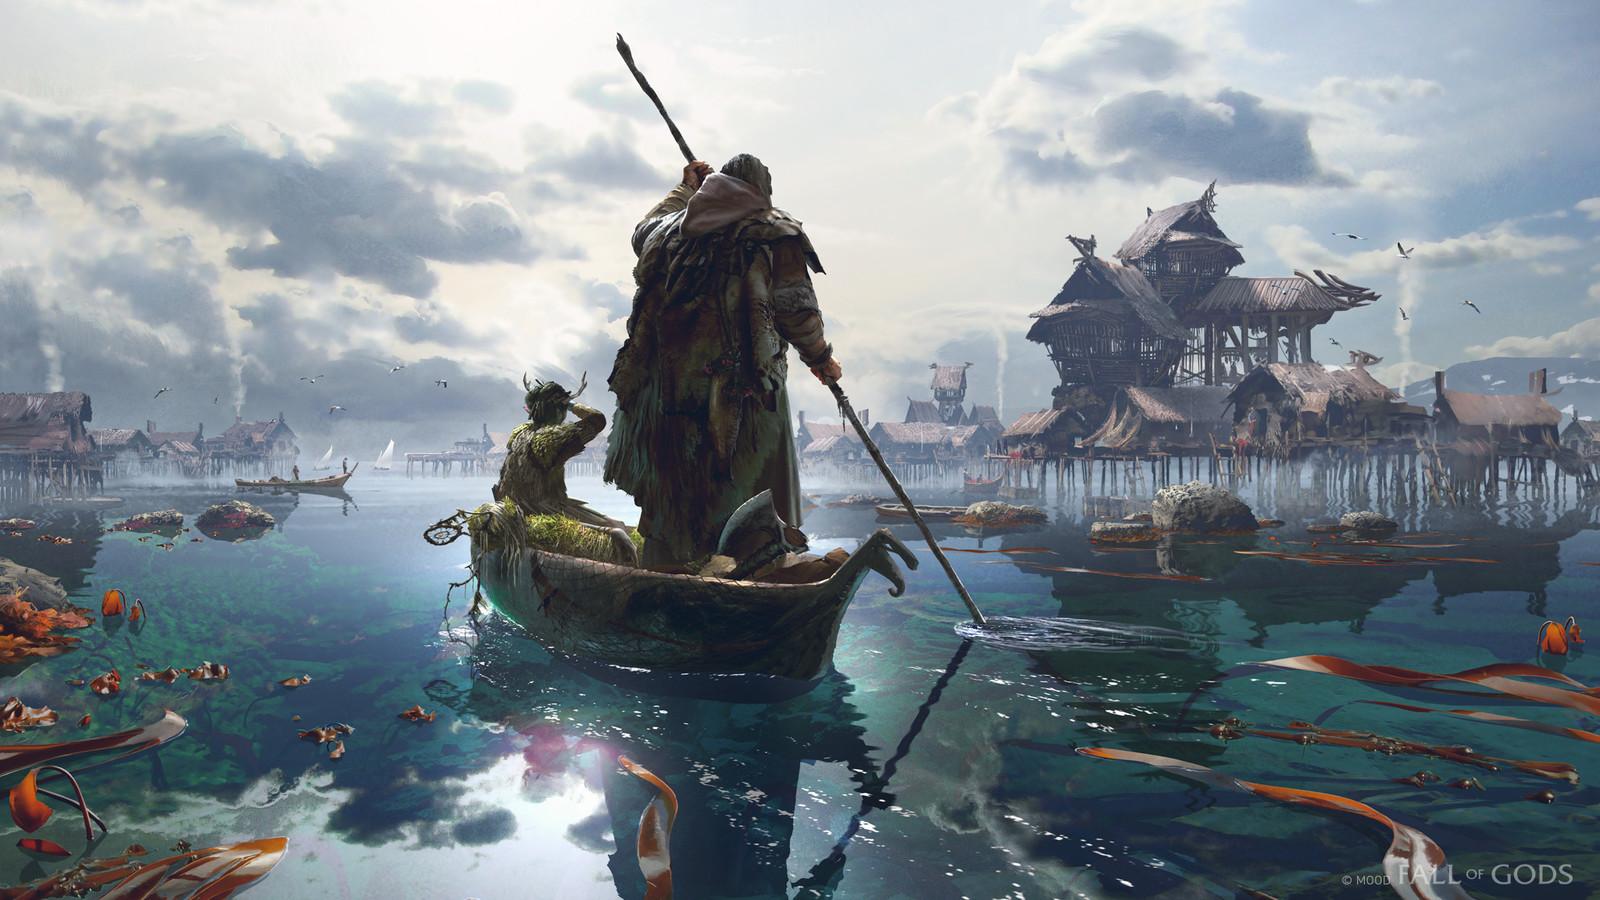 Fall Of Gods - Fishing Village